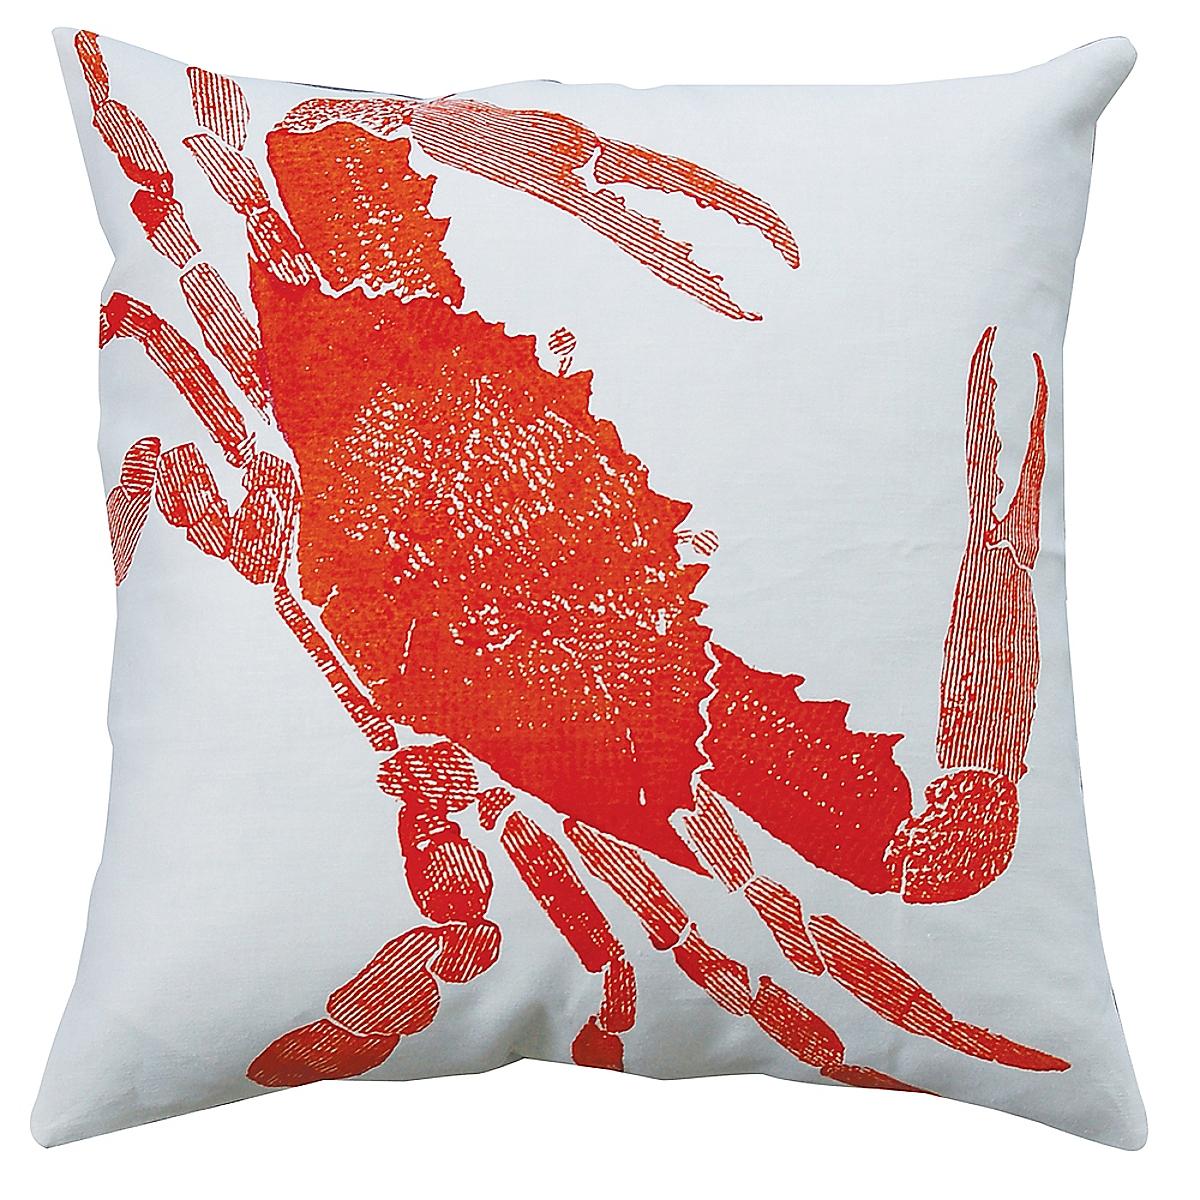 "20"" x 20"" - Crab Pillow: Rhubarb on White Linen"